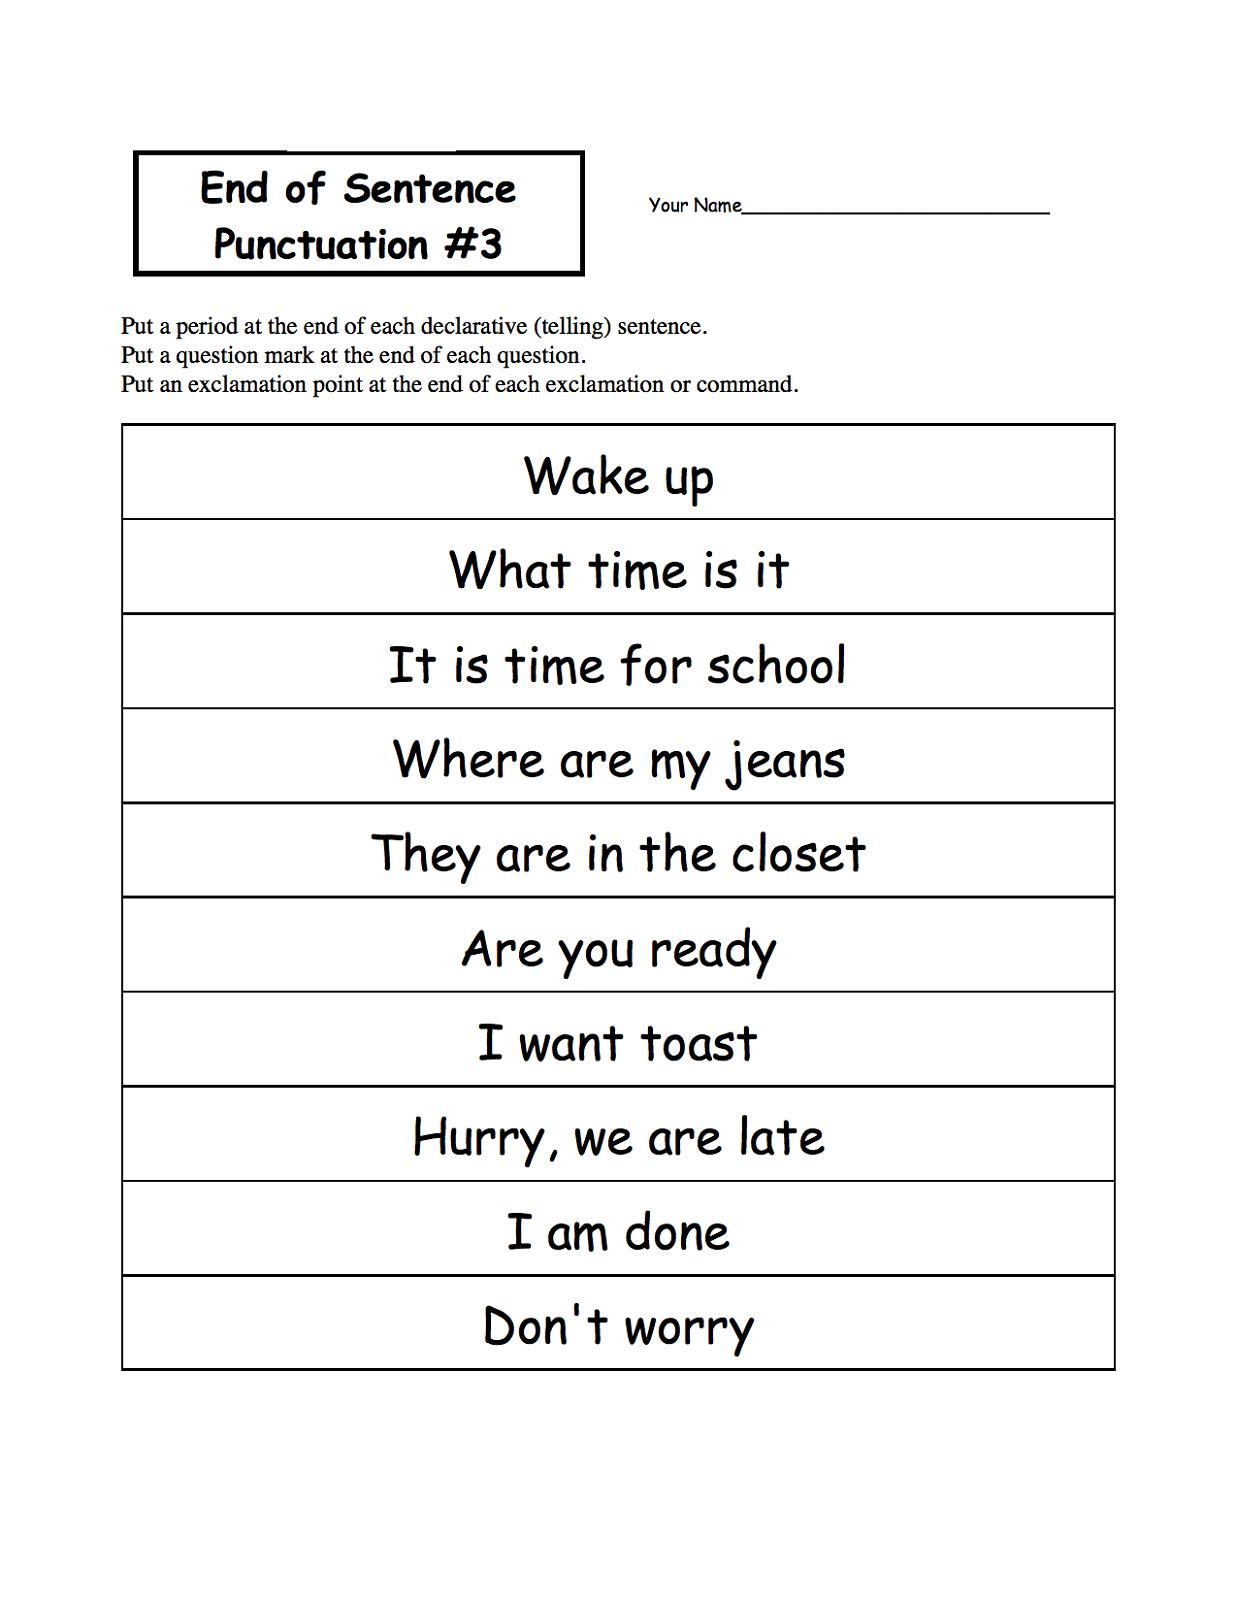 english worksheets ks1 free printable sentence printable shelter kids worksheets printable. Black Bedroom Furniture Sets. Home Design Ideas